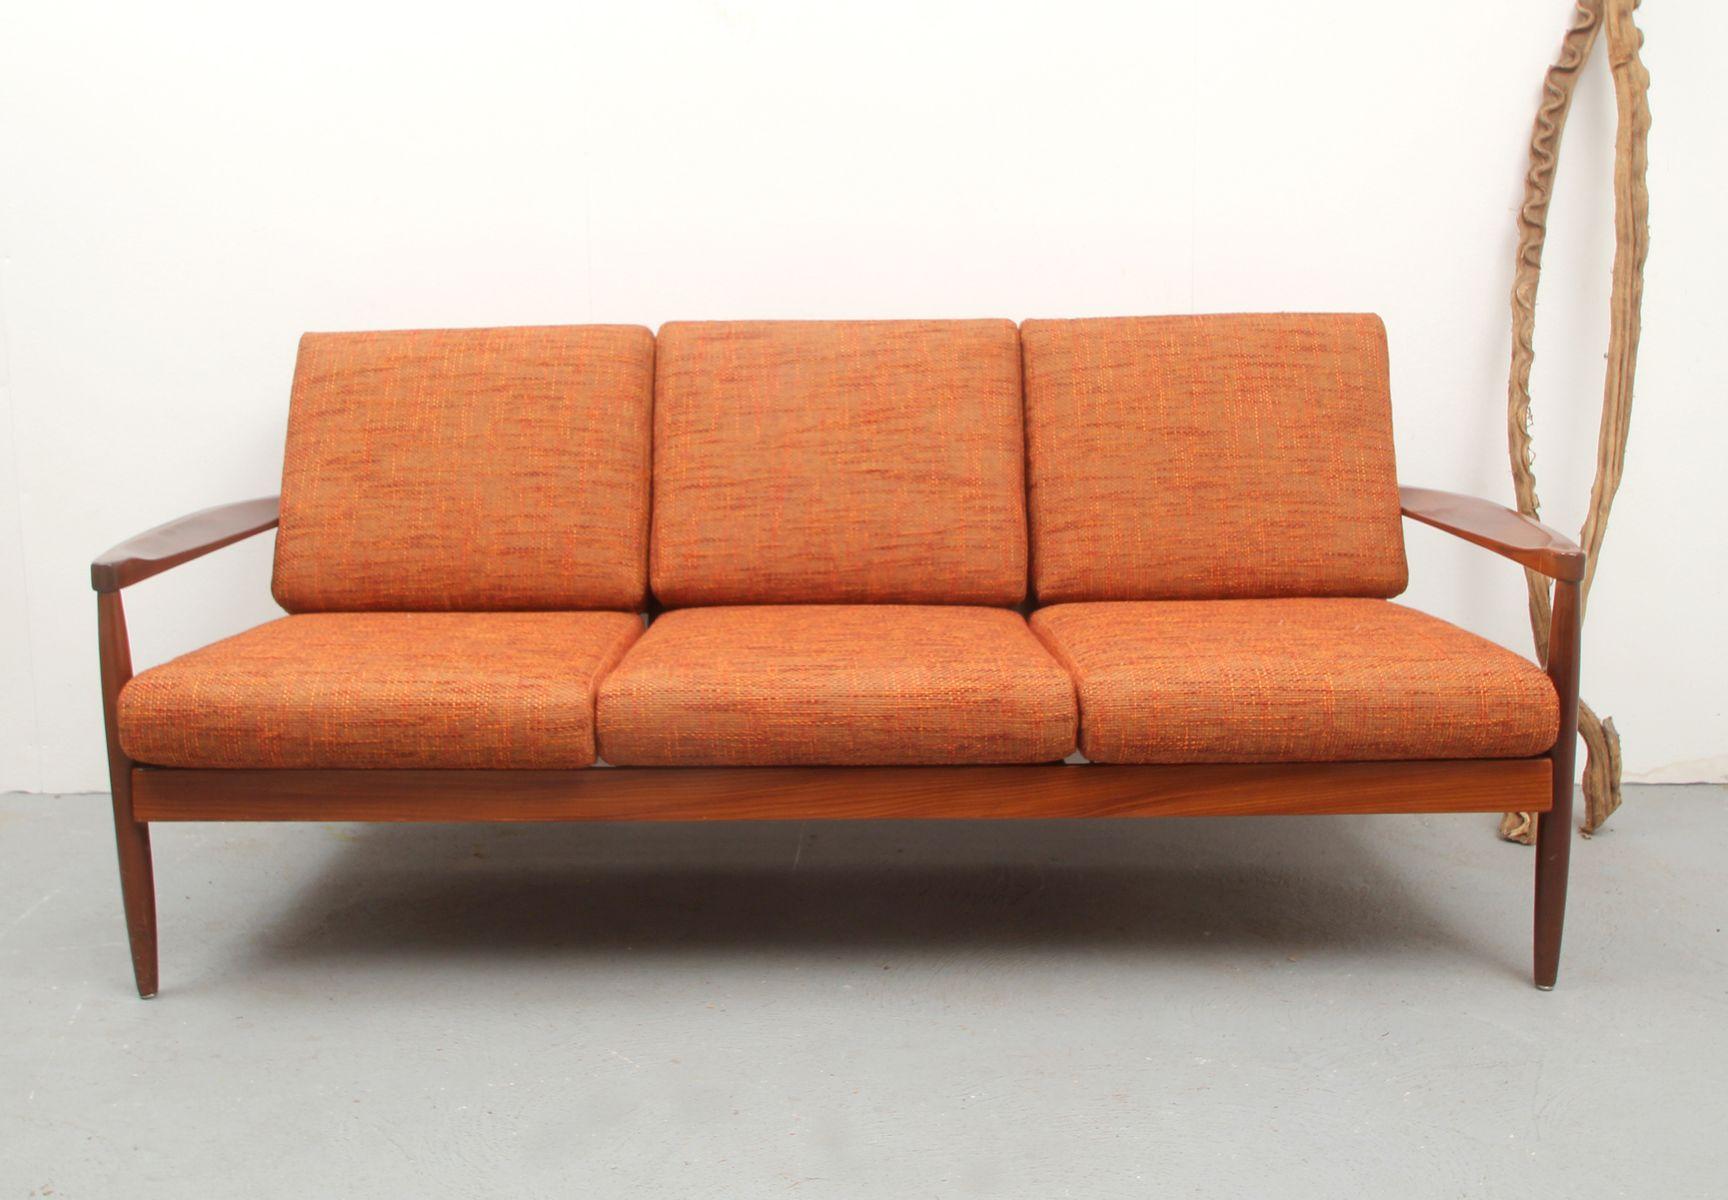 Mid Century Teak Sofa 1960s For Sale At Pamono